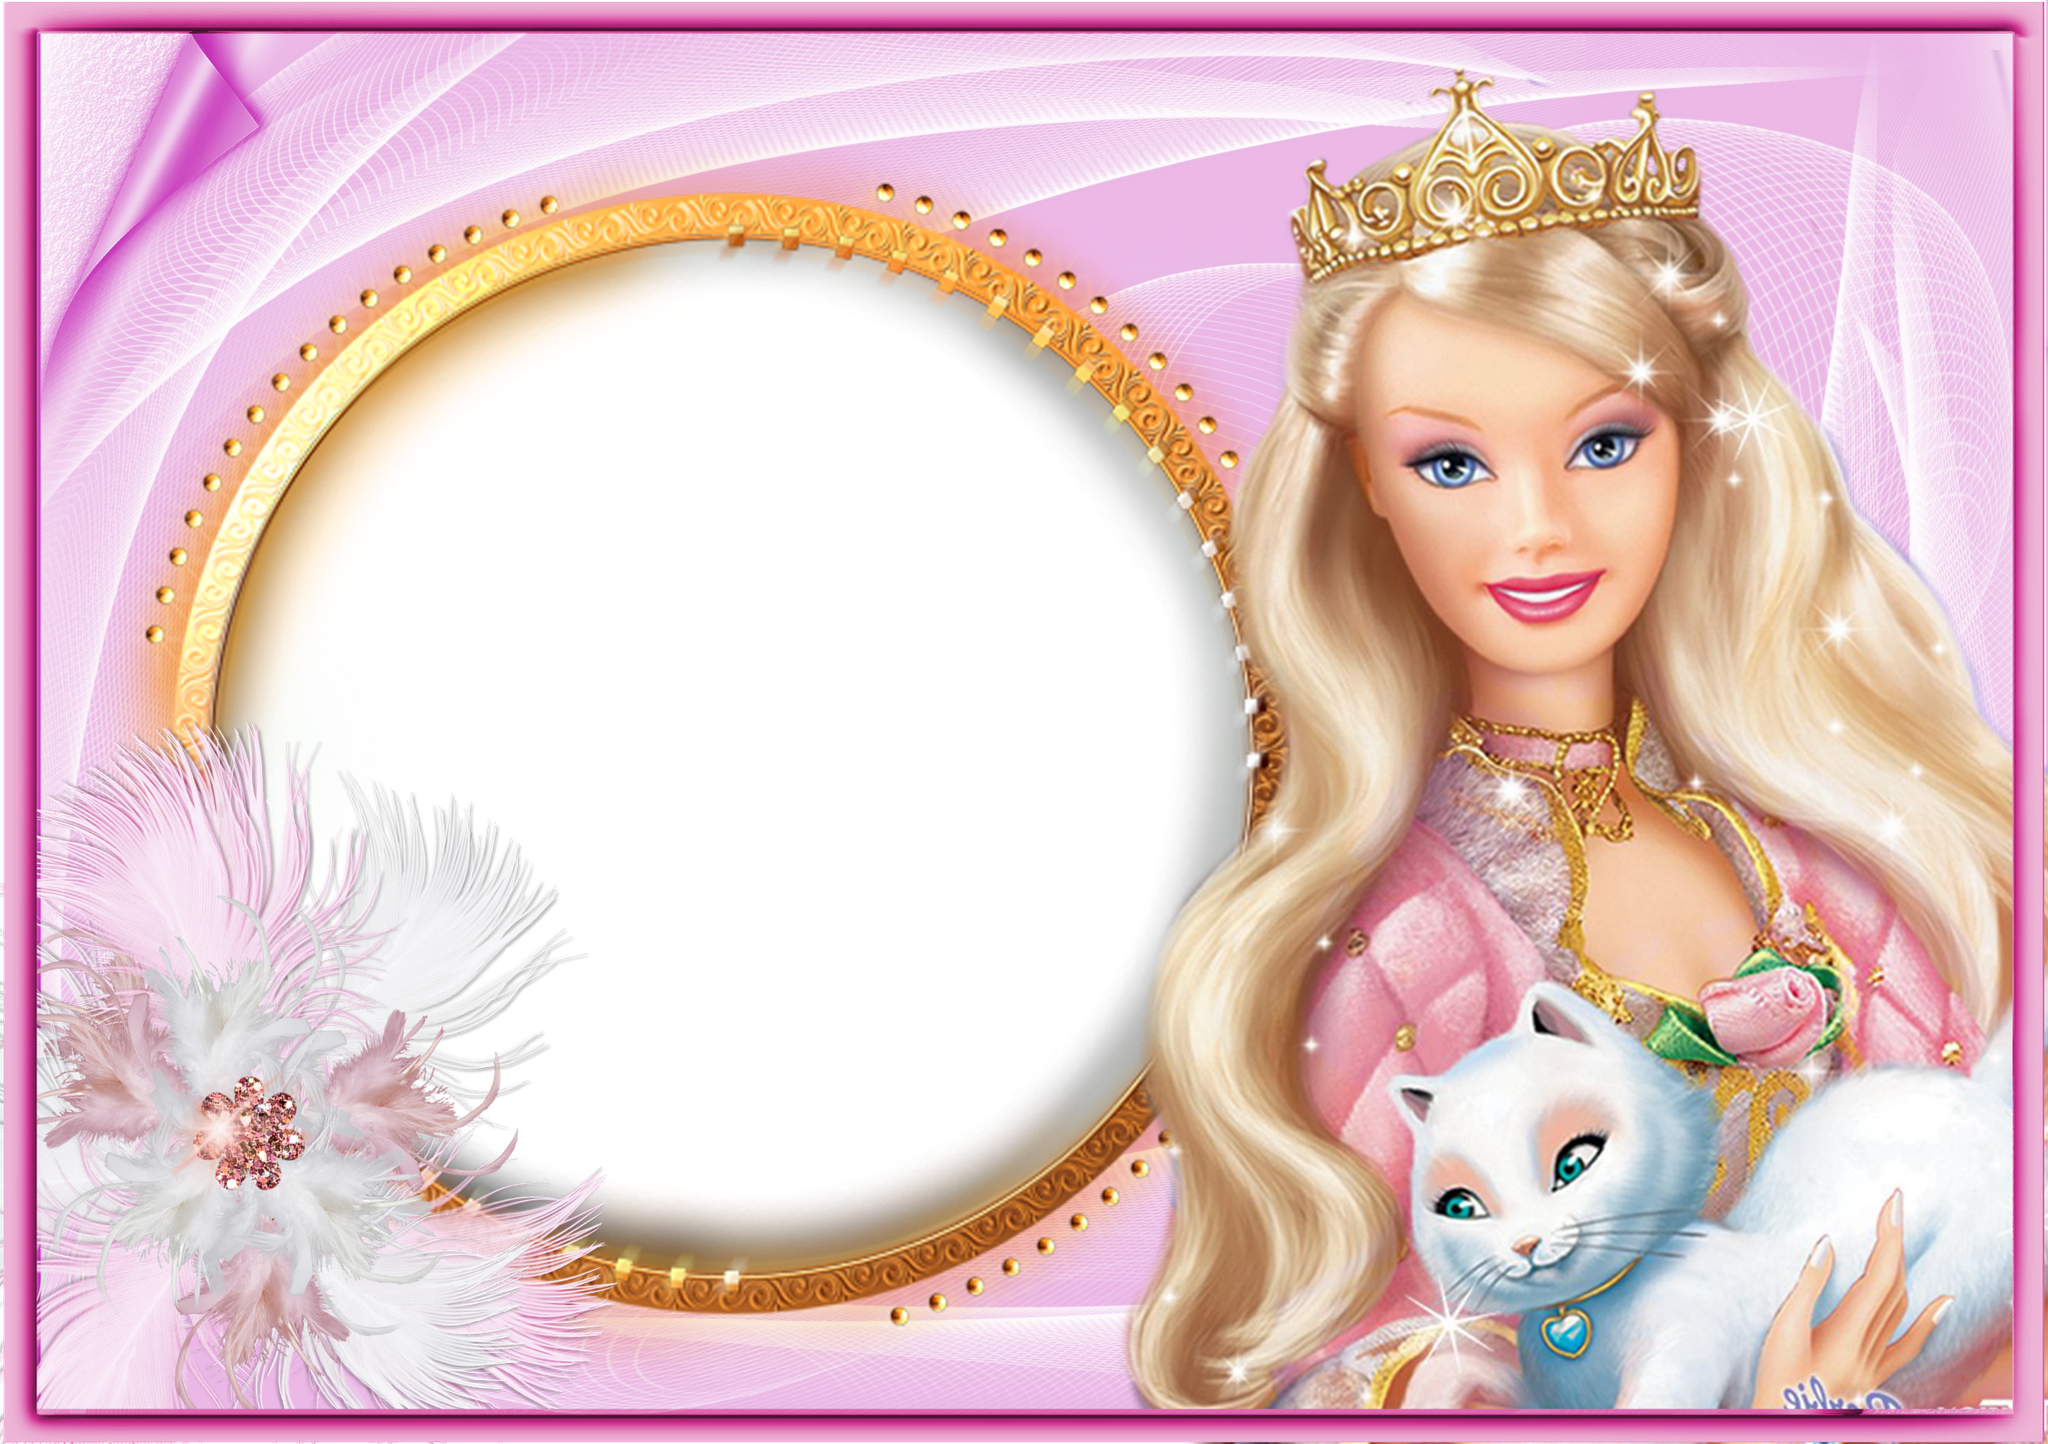 barbie frame Google Search Barbie theme, Barbie